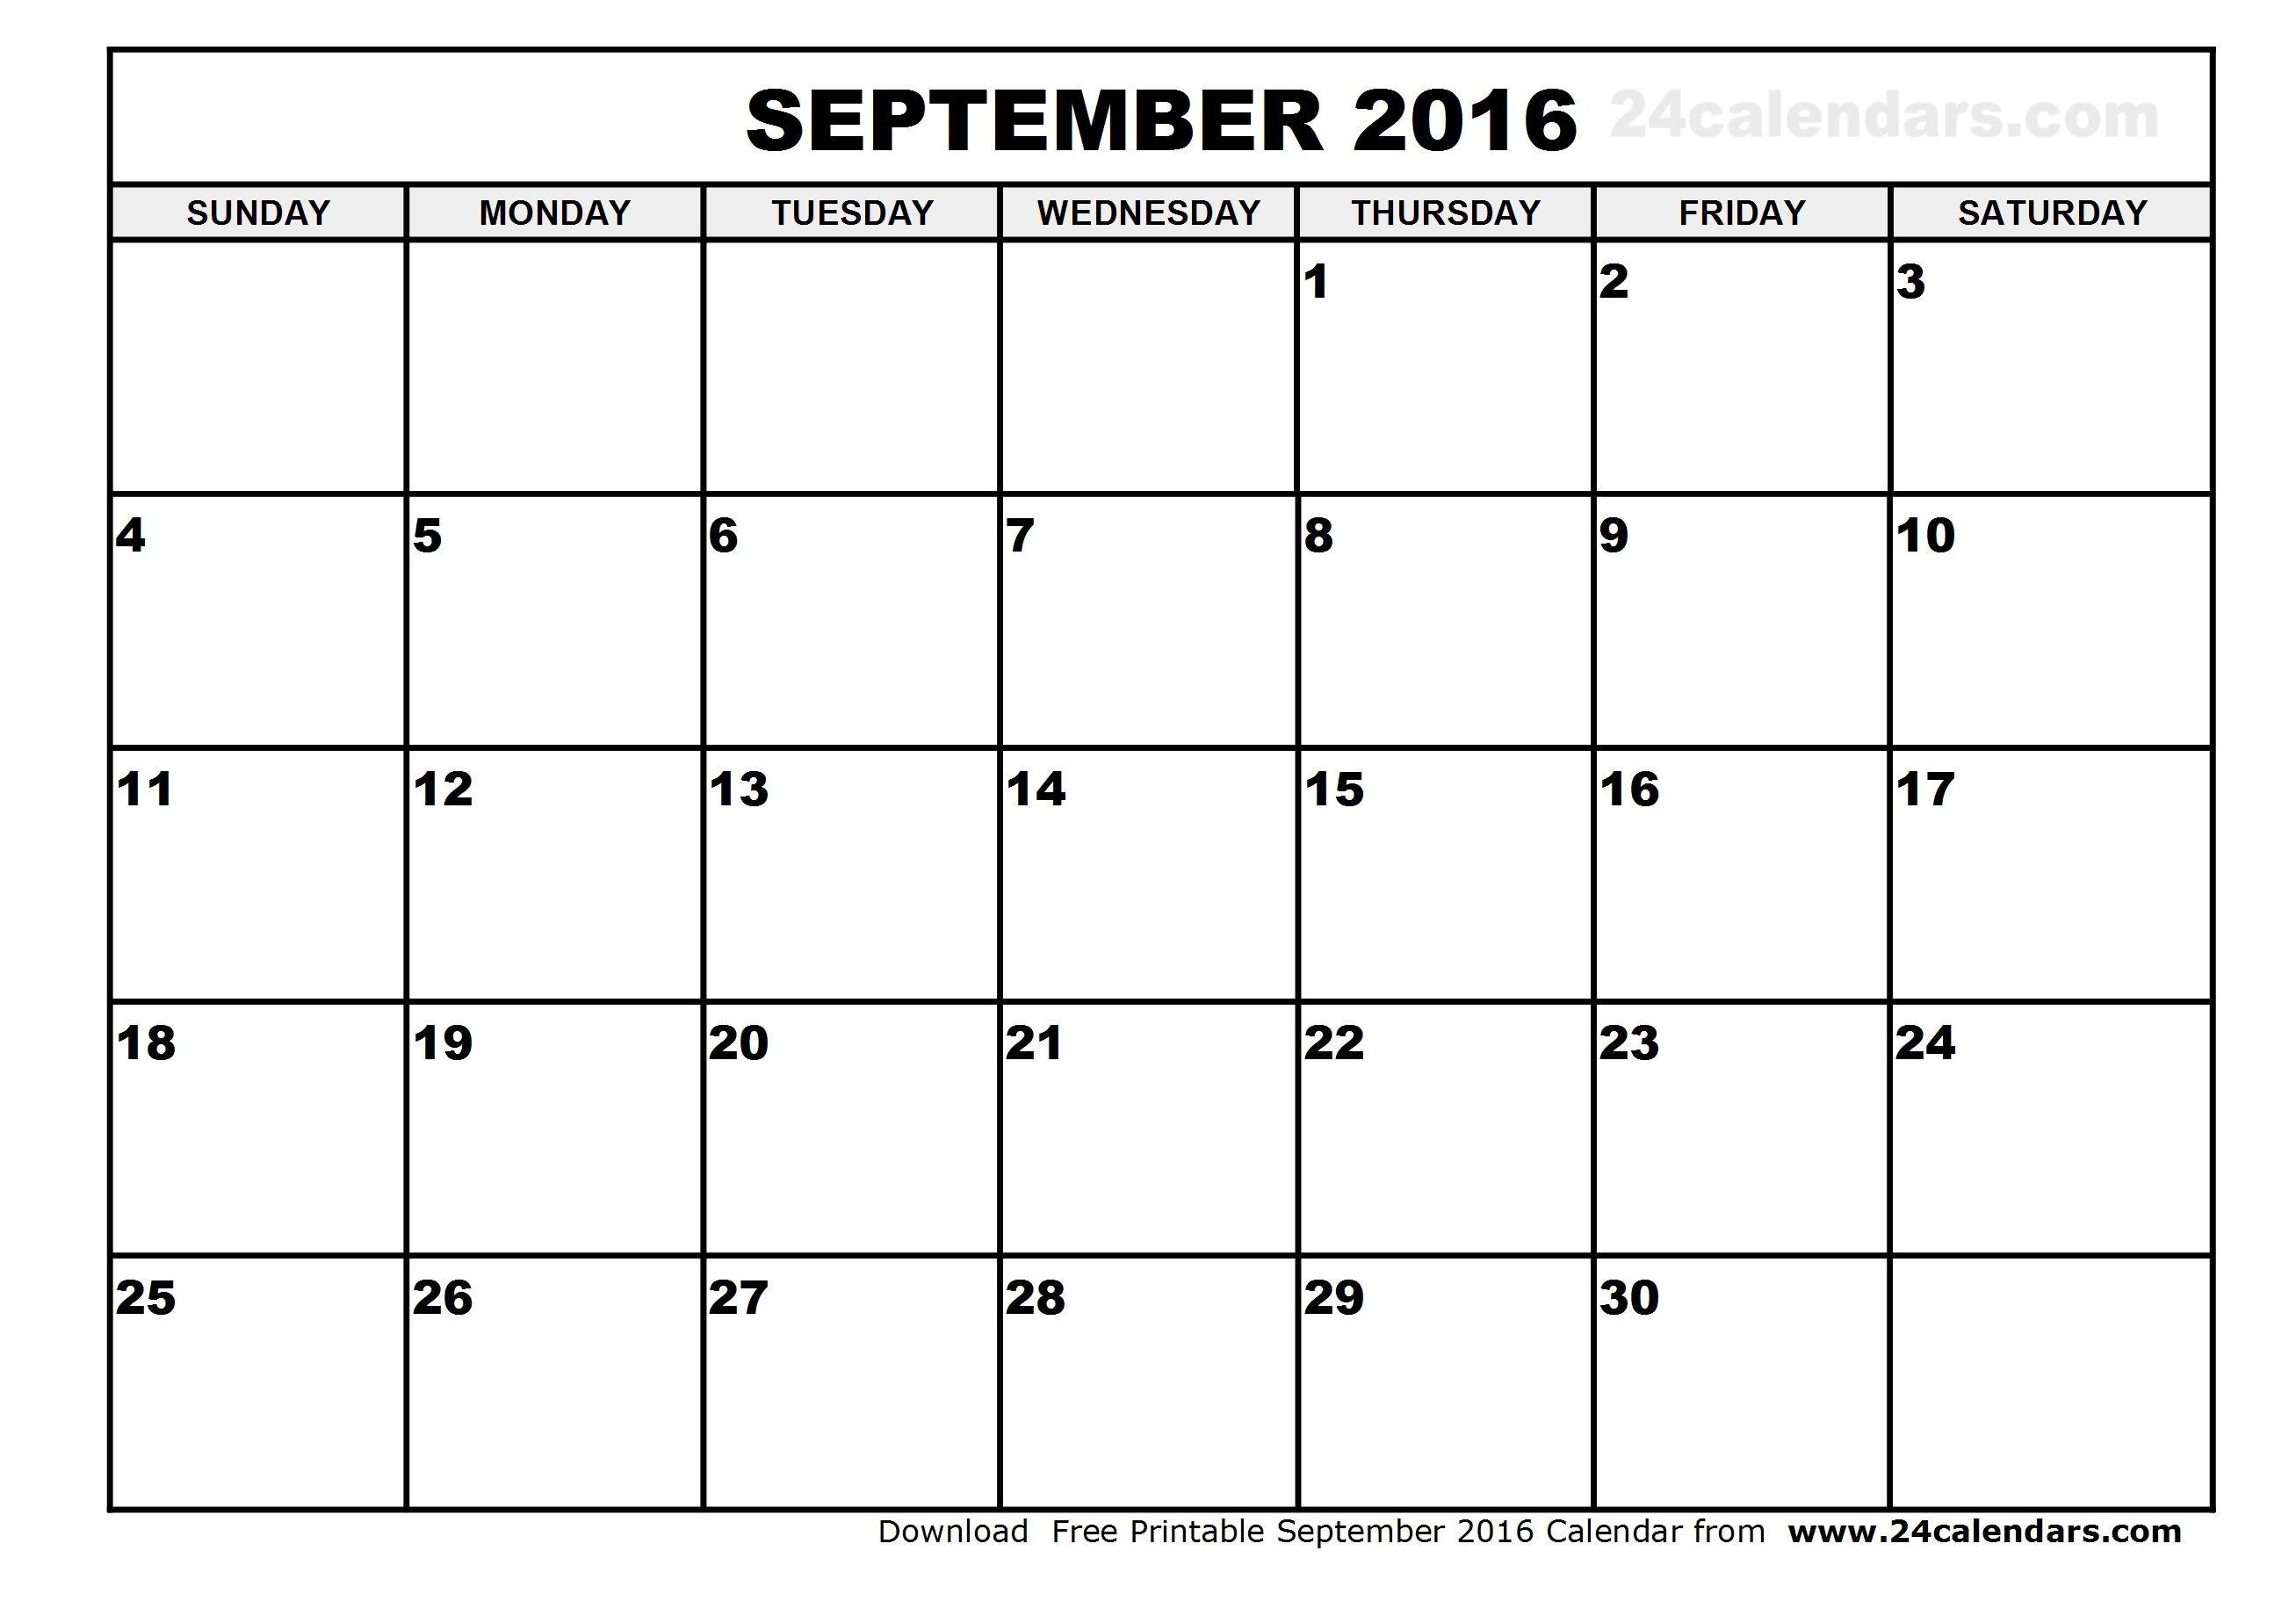 Printable September 2016 Calendar Template Thekpark Hadong